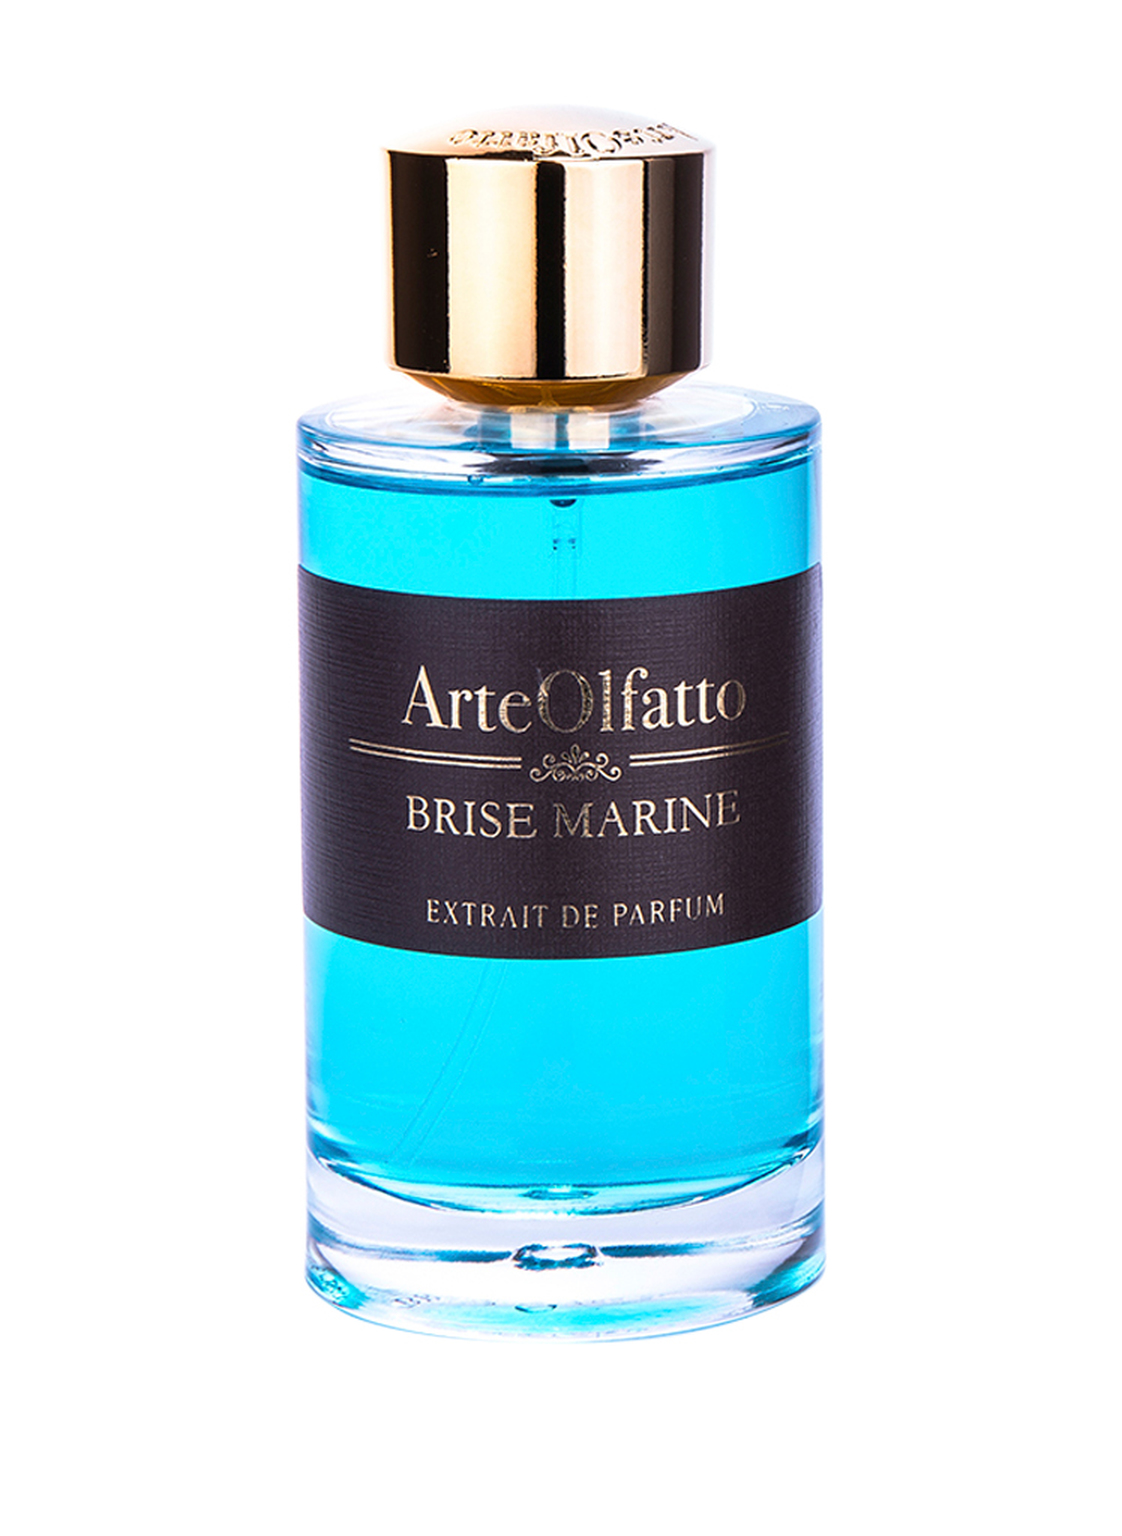 Image of Arte Olfatto Brise Marine Eau de Parfum 100 ml